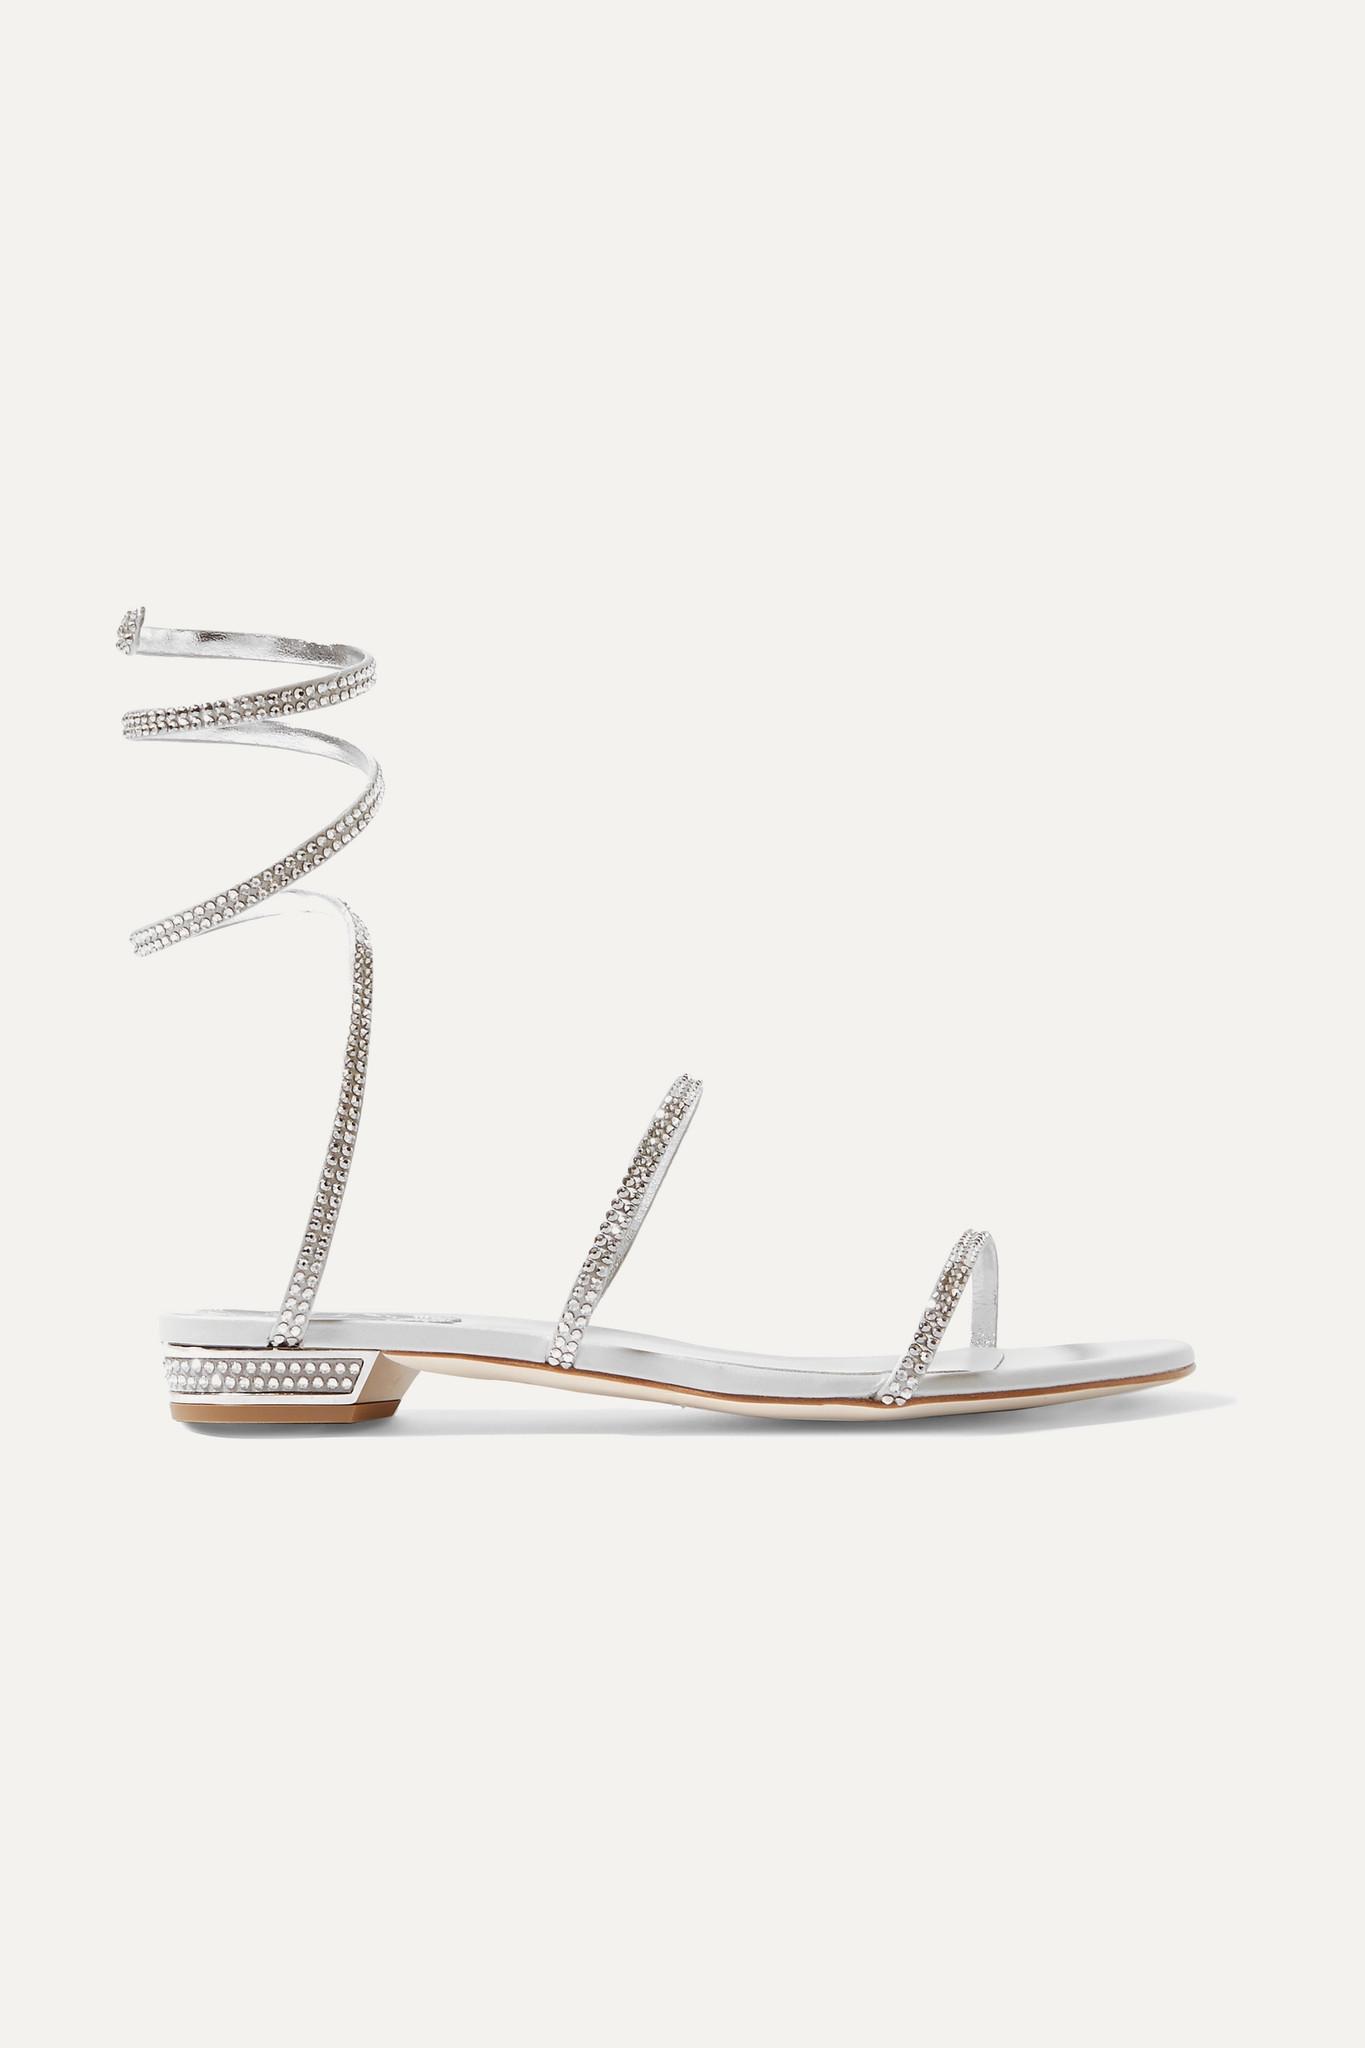 RENÉ CAOVILLA - Cleo 水晶缀饰金属感皮革凉鞋 - 银色 - IT39